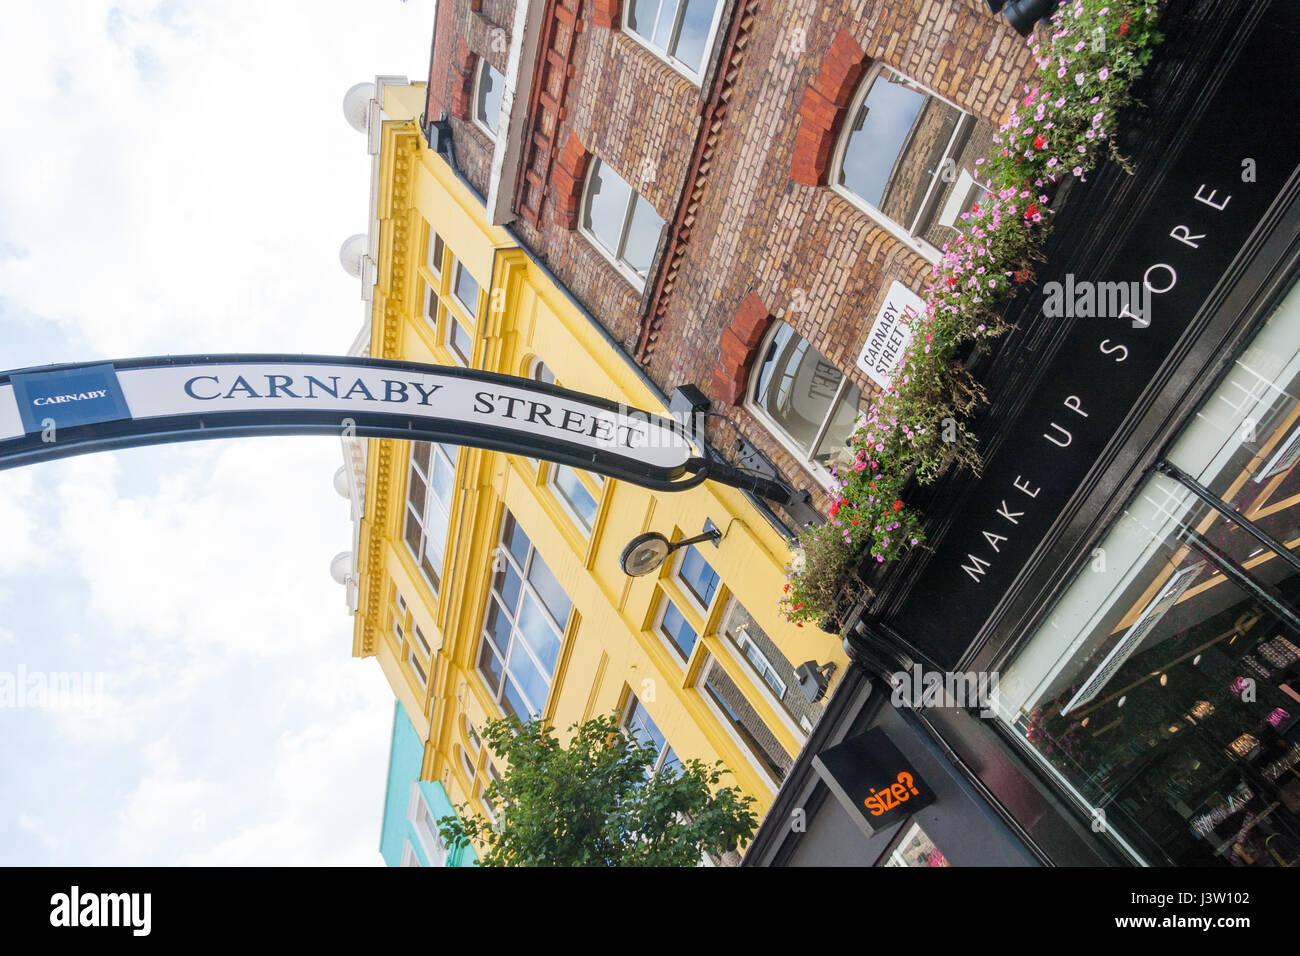 Carnaby street, London, England - Stock Image